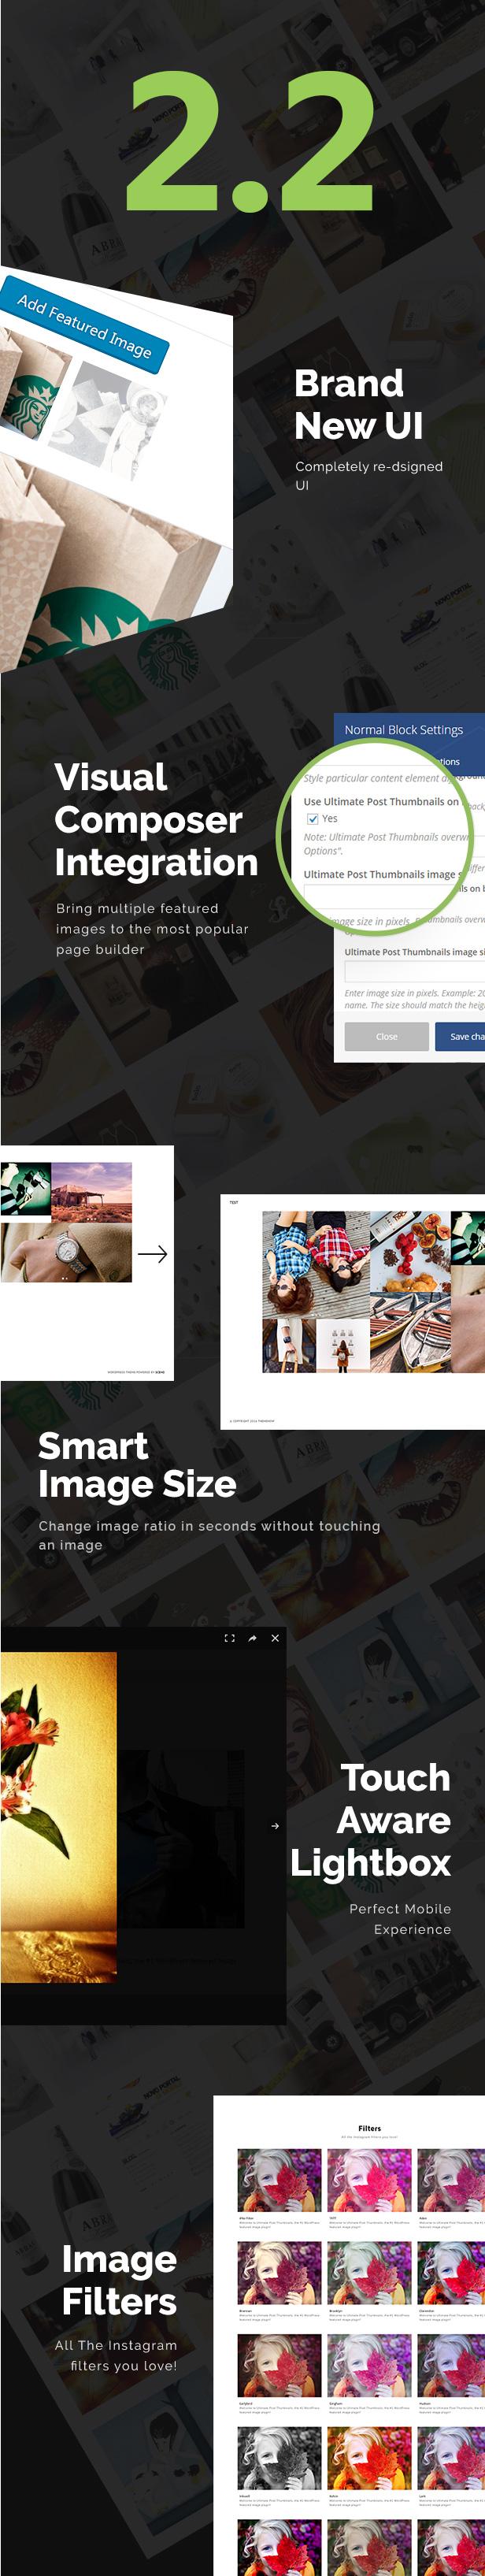 Ultimate Post Thumbnails WordPress Plugin by addway | CodeCanyon